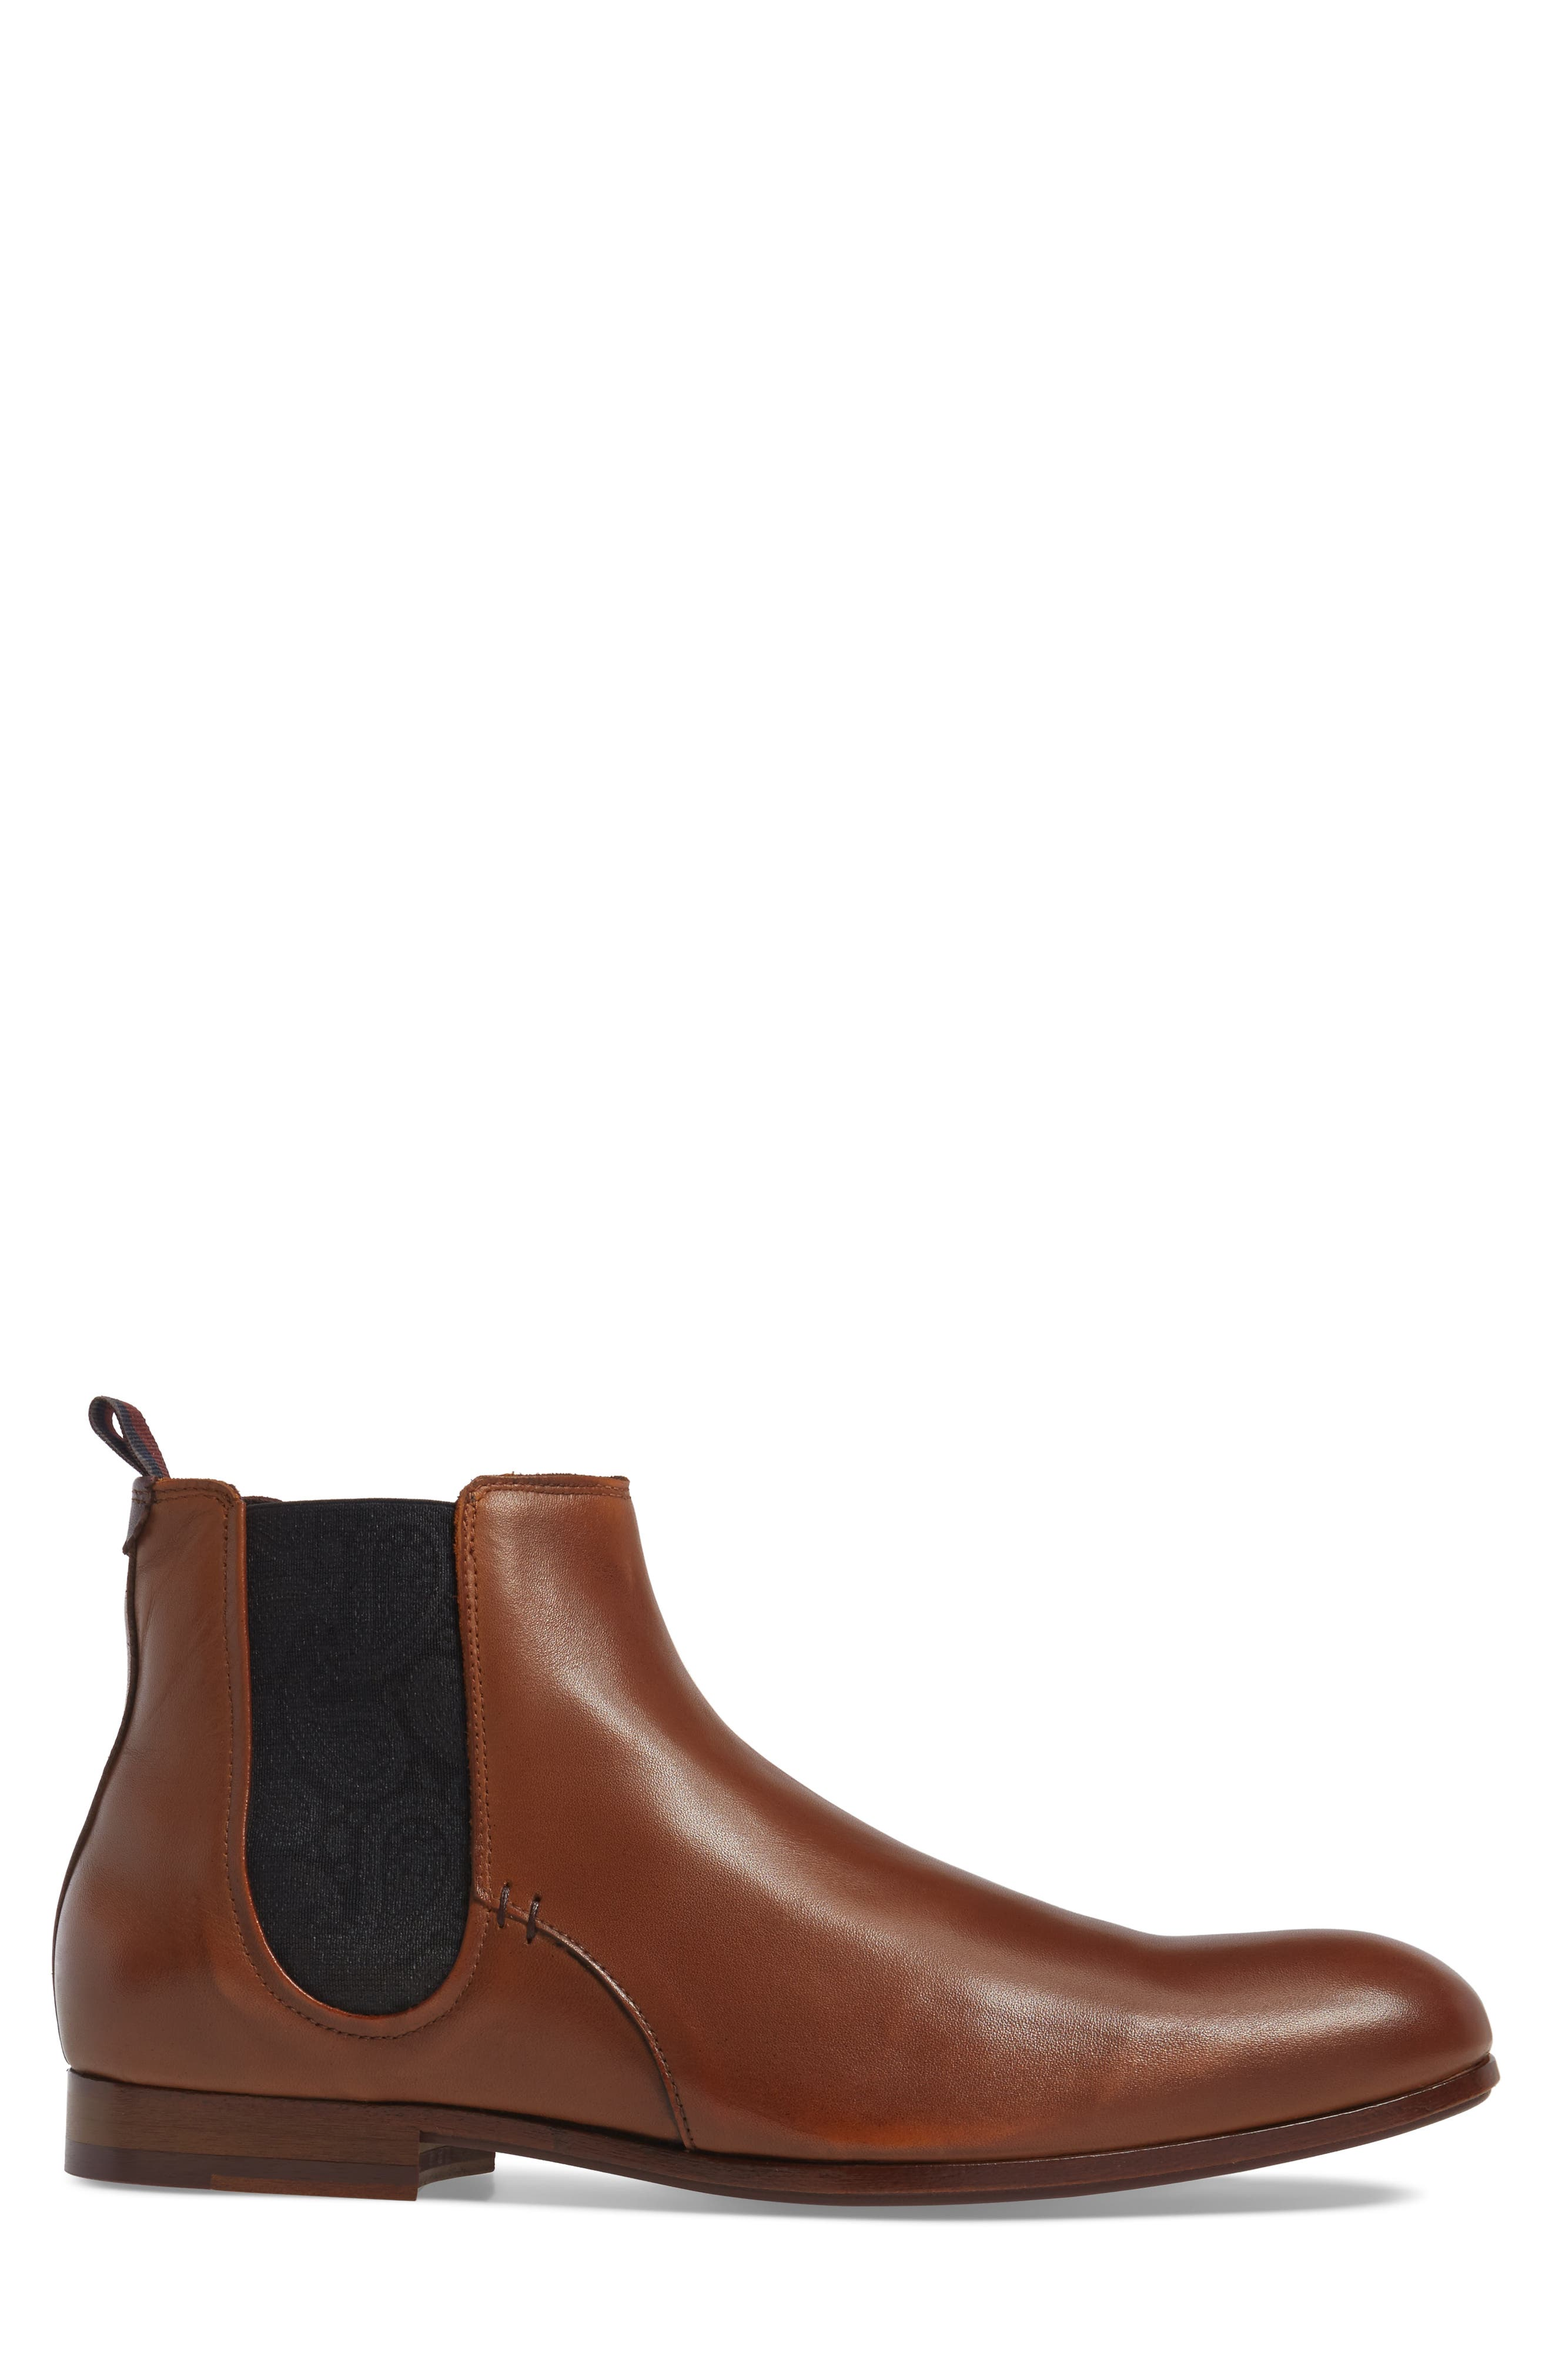 Zenier Chelsea Boot,                             Alternate thumbnail 3, color,